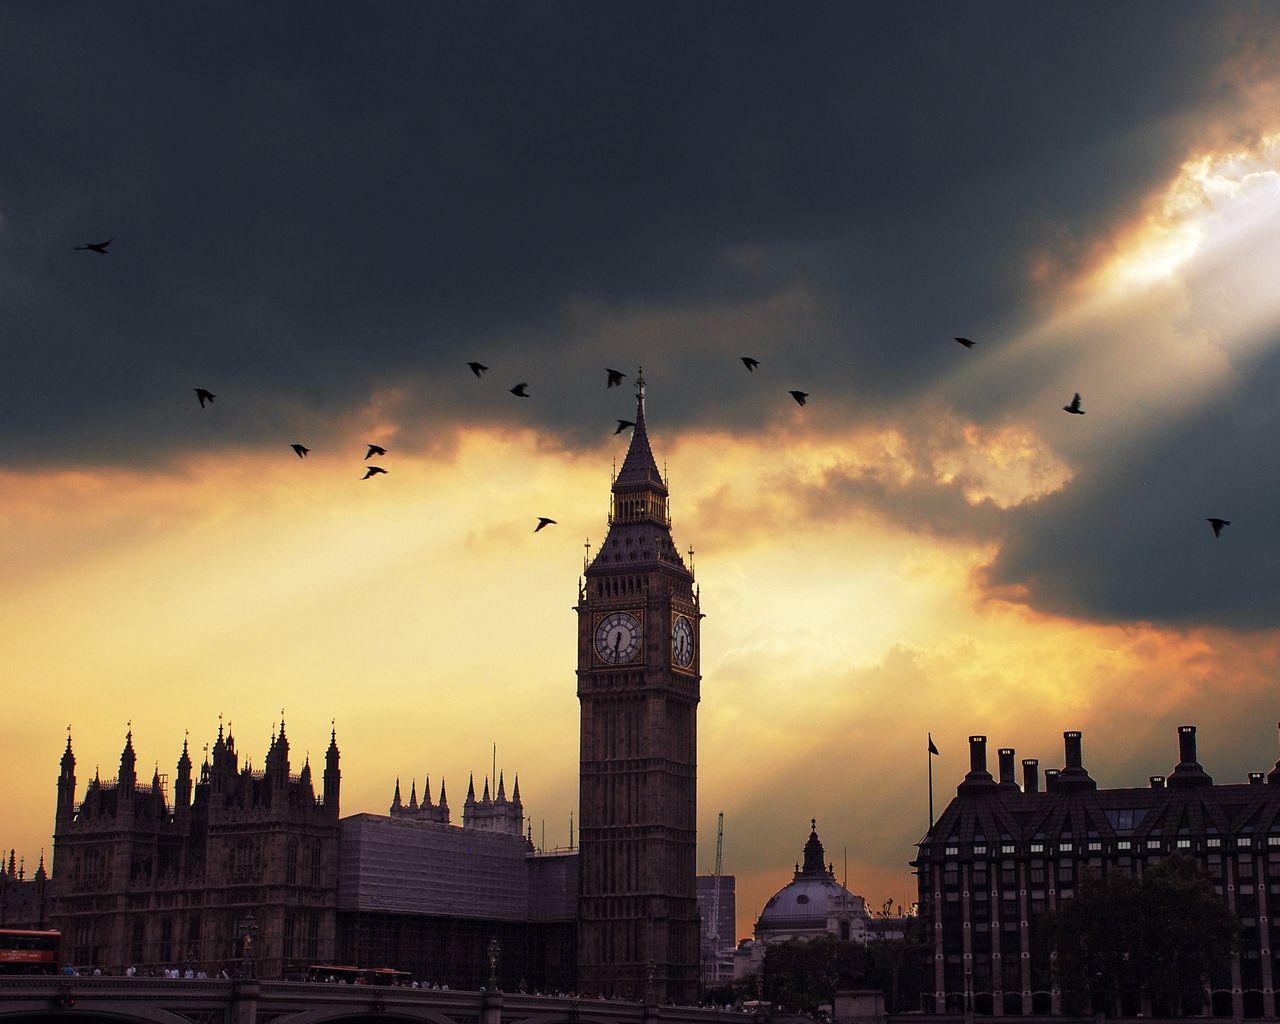 1280x1024 Wallpaper london, big ben, sunset, shadow, sky